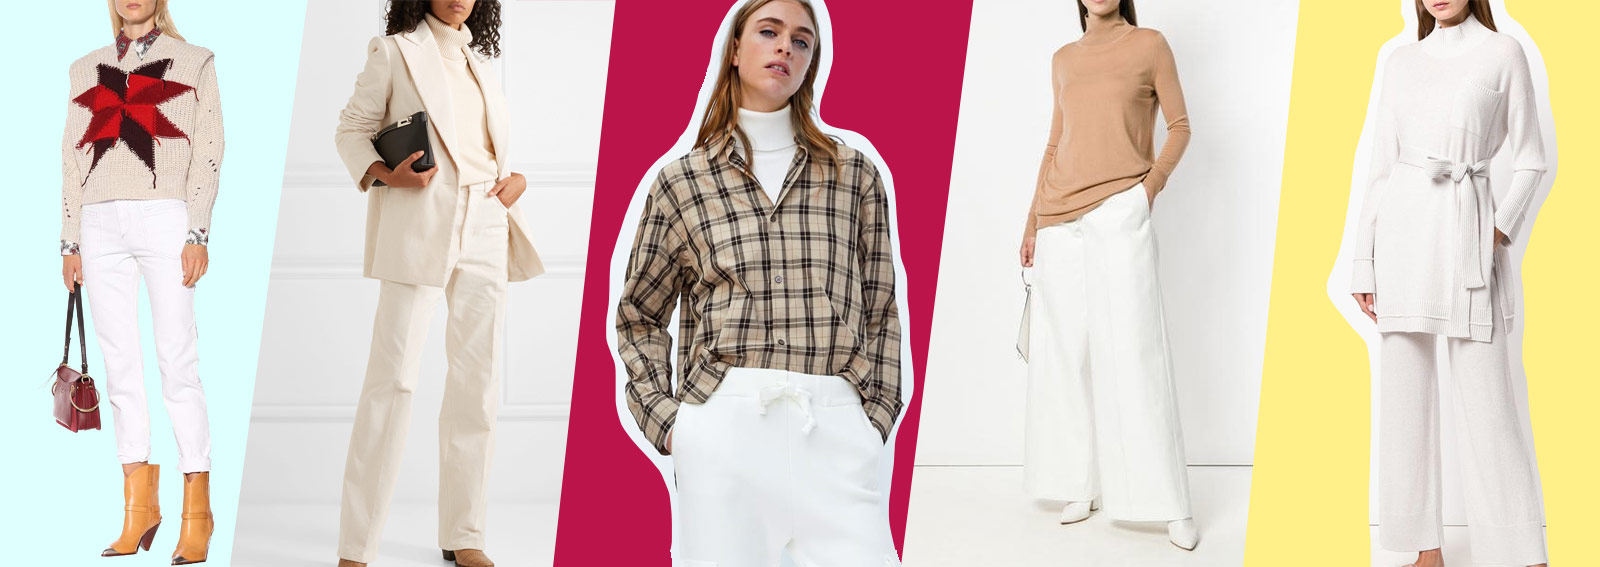 COVER-pantaloni-bianchi-inverno-DESKTOP